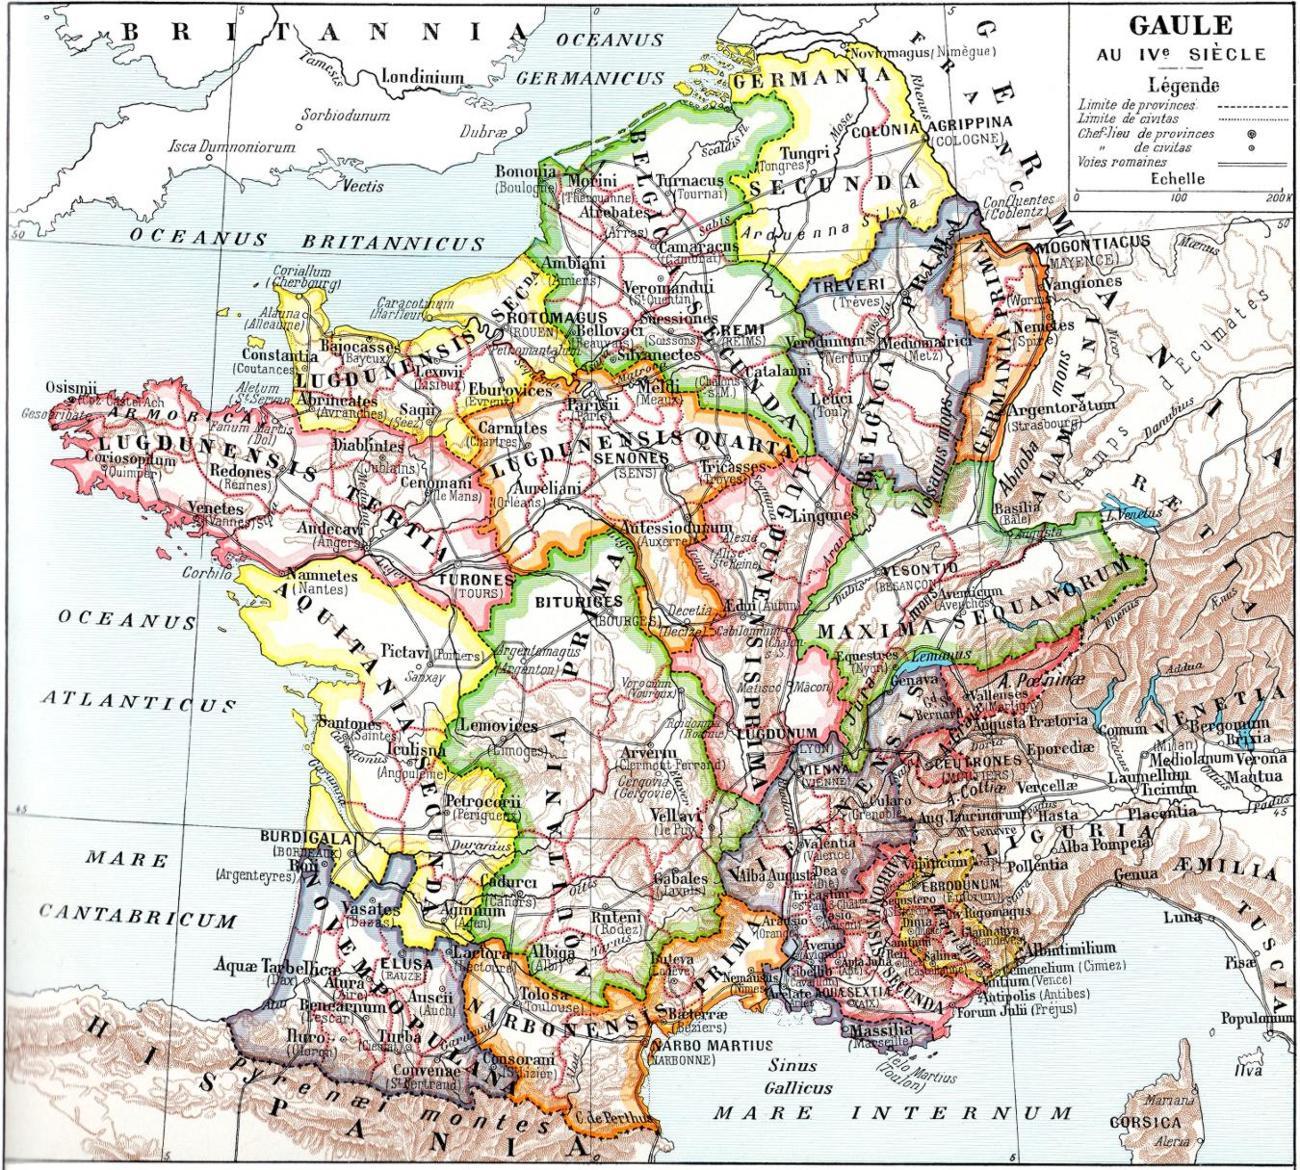 Gaule-Romaine-IV 14 province.jpg